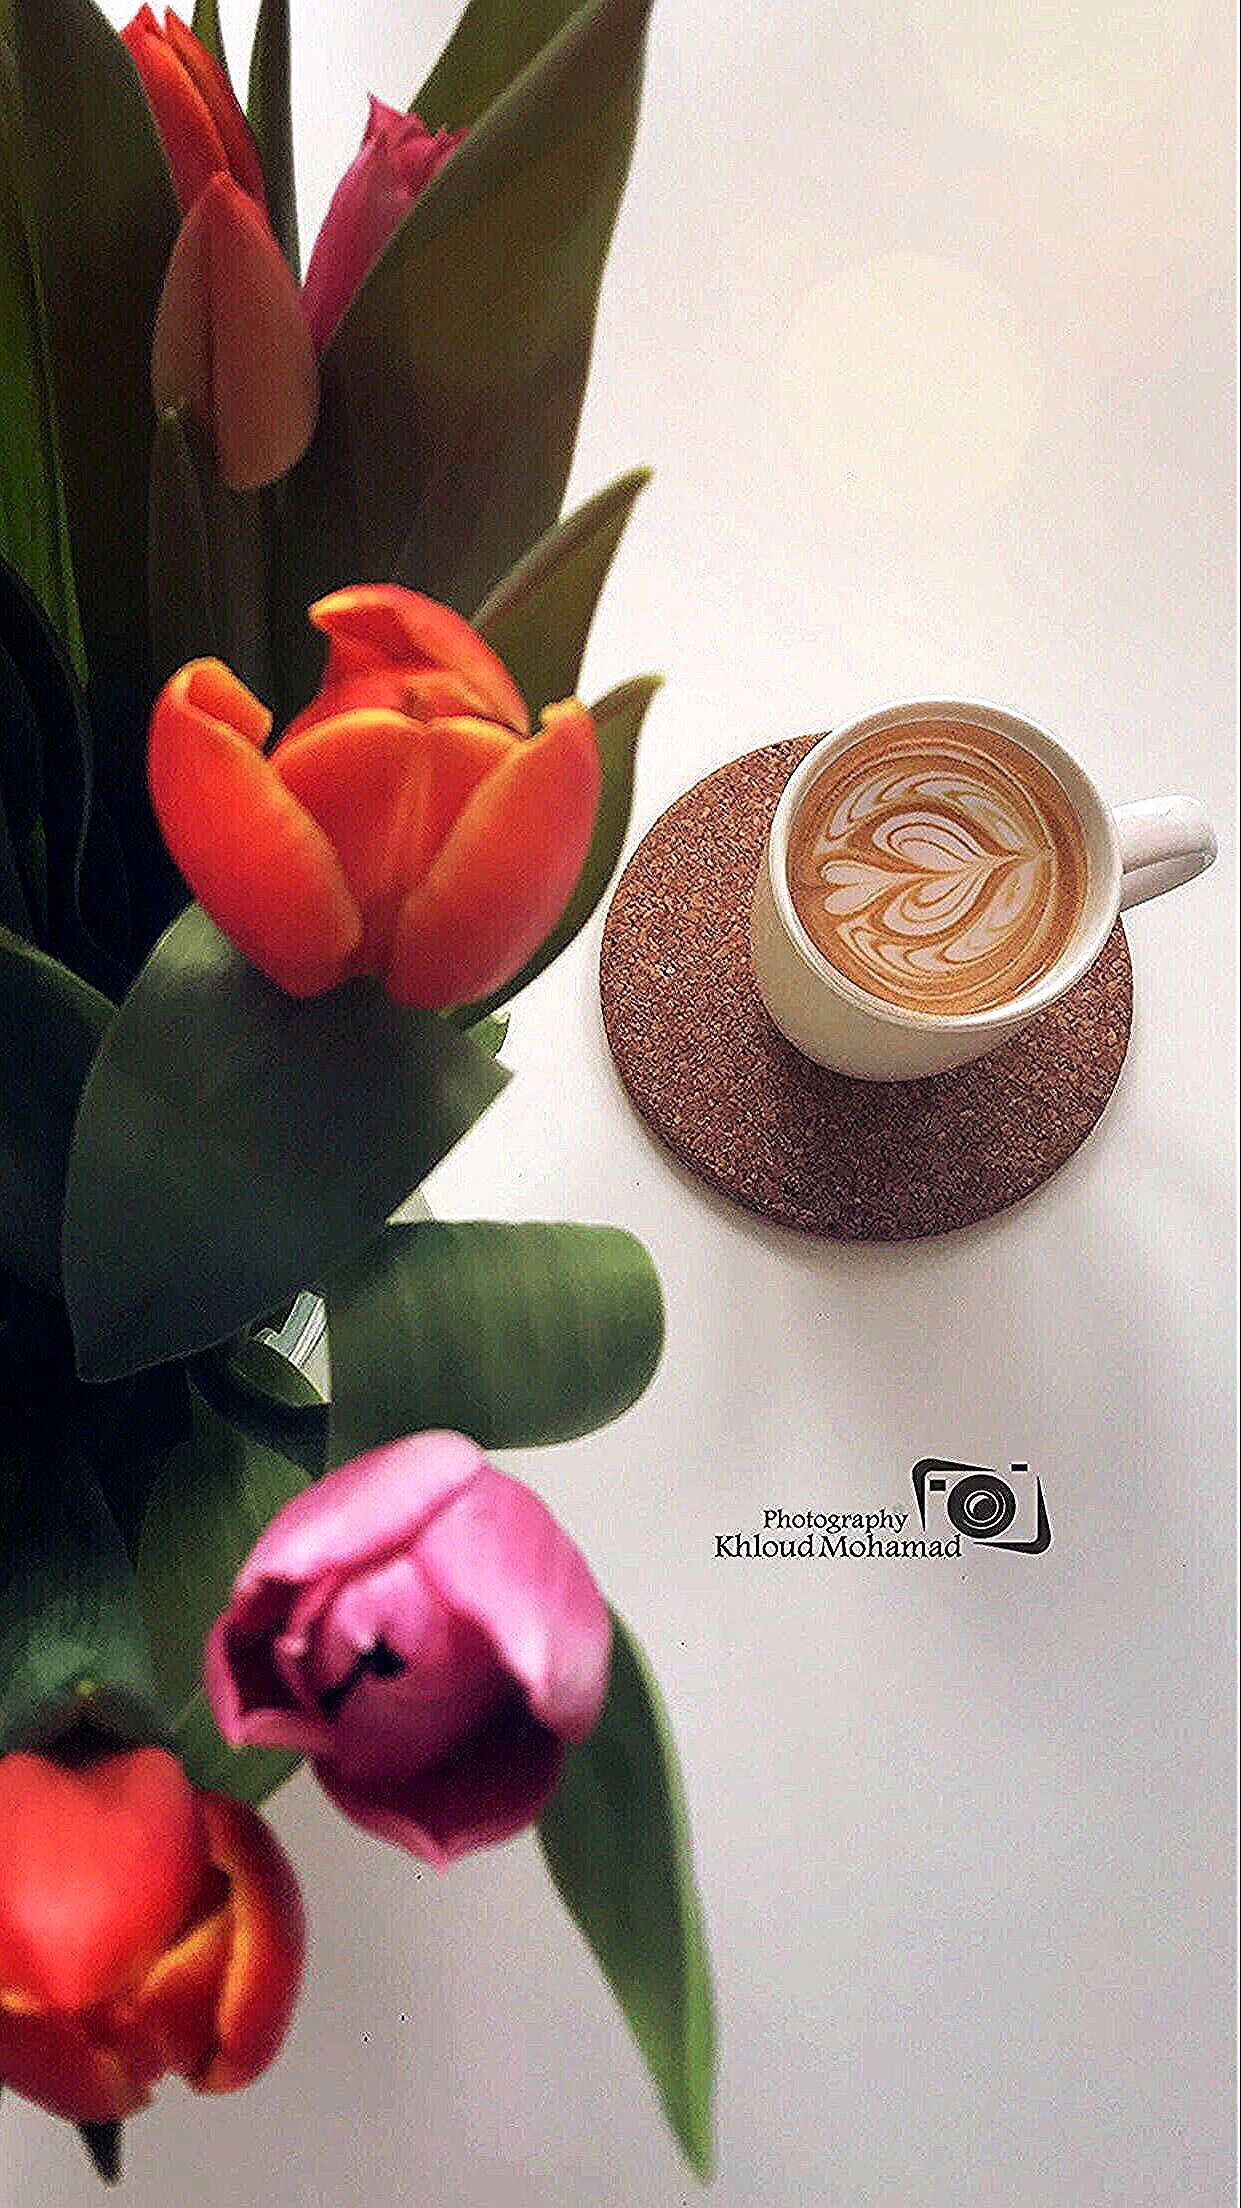 Mysnap Myfoto Mycoffee Photography Goodmorning Rose Beautiful قهود ورد زنبق دفا رواق Fruit Peach Food